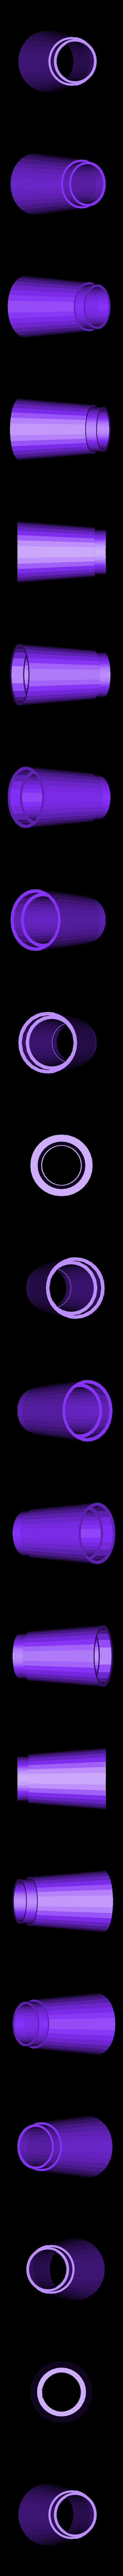 03.stl Download free STL file Fuse Hollow • Model to 3D print, delmich